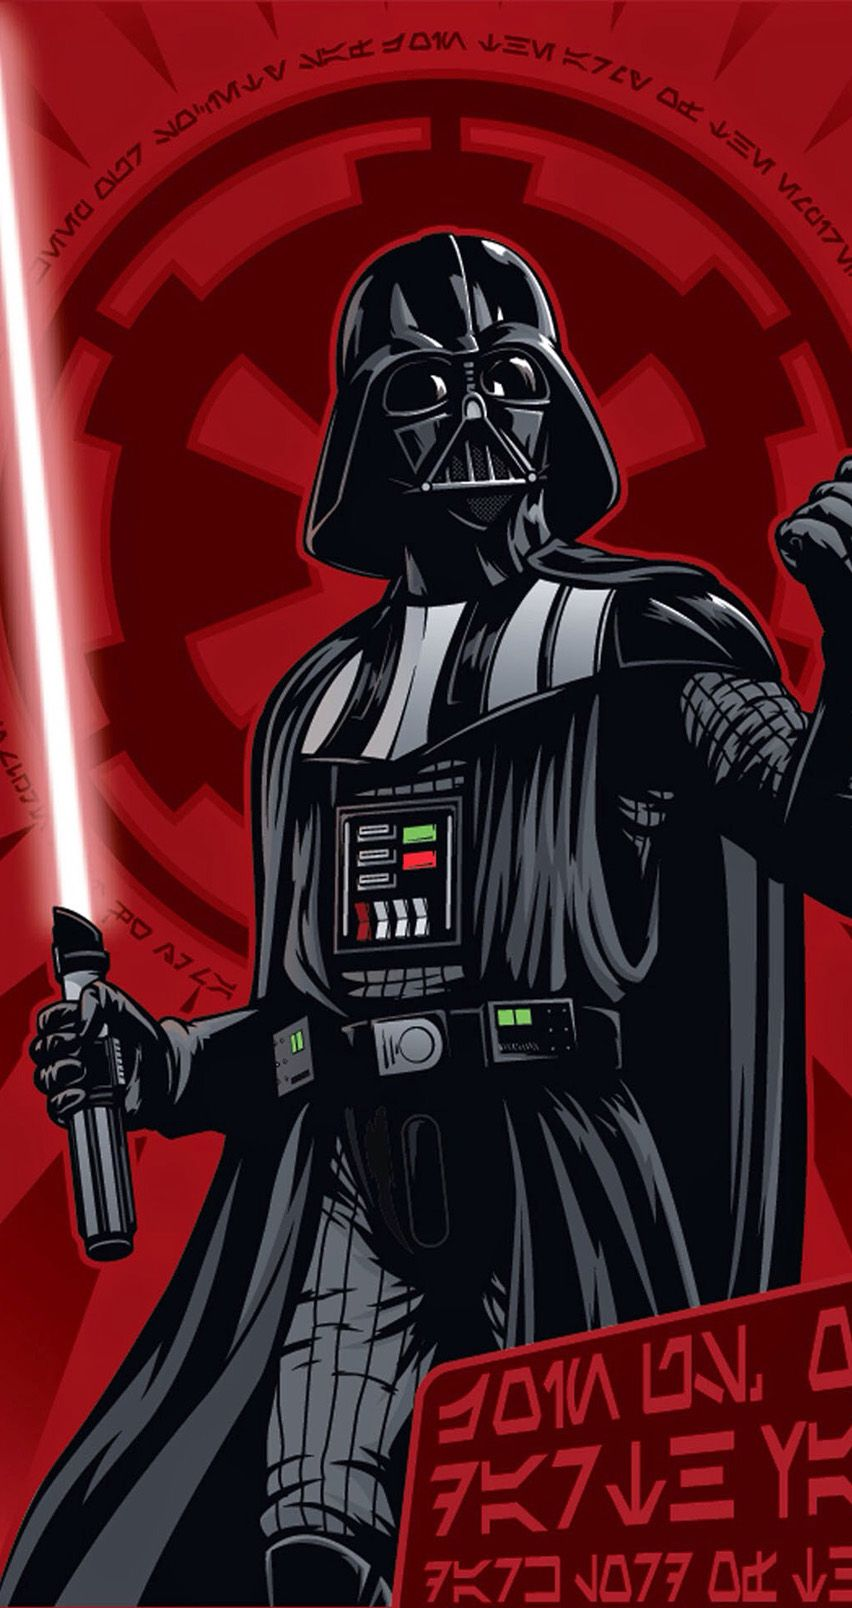 Dark Lord aka Darth Vader. Star Wars Rebellion Propaganda